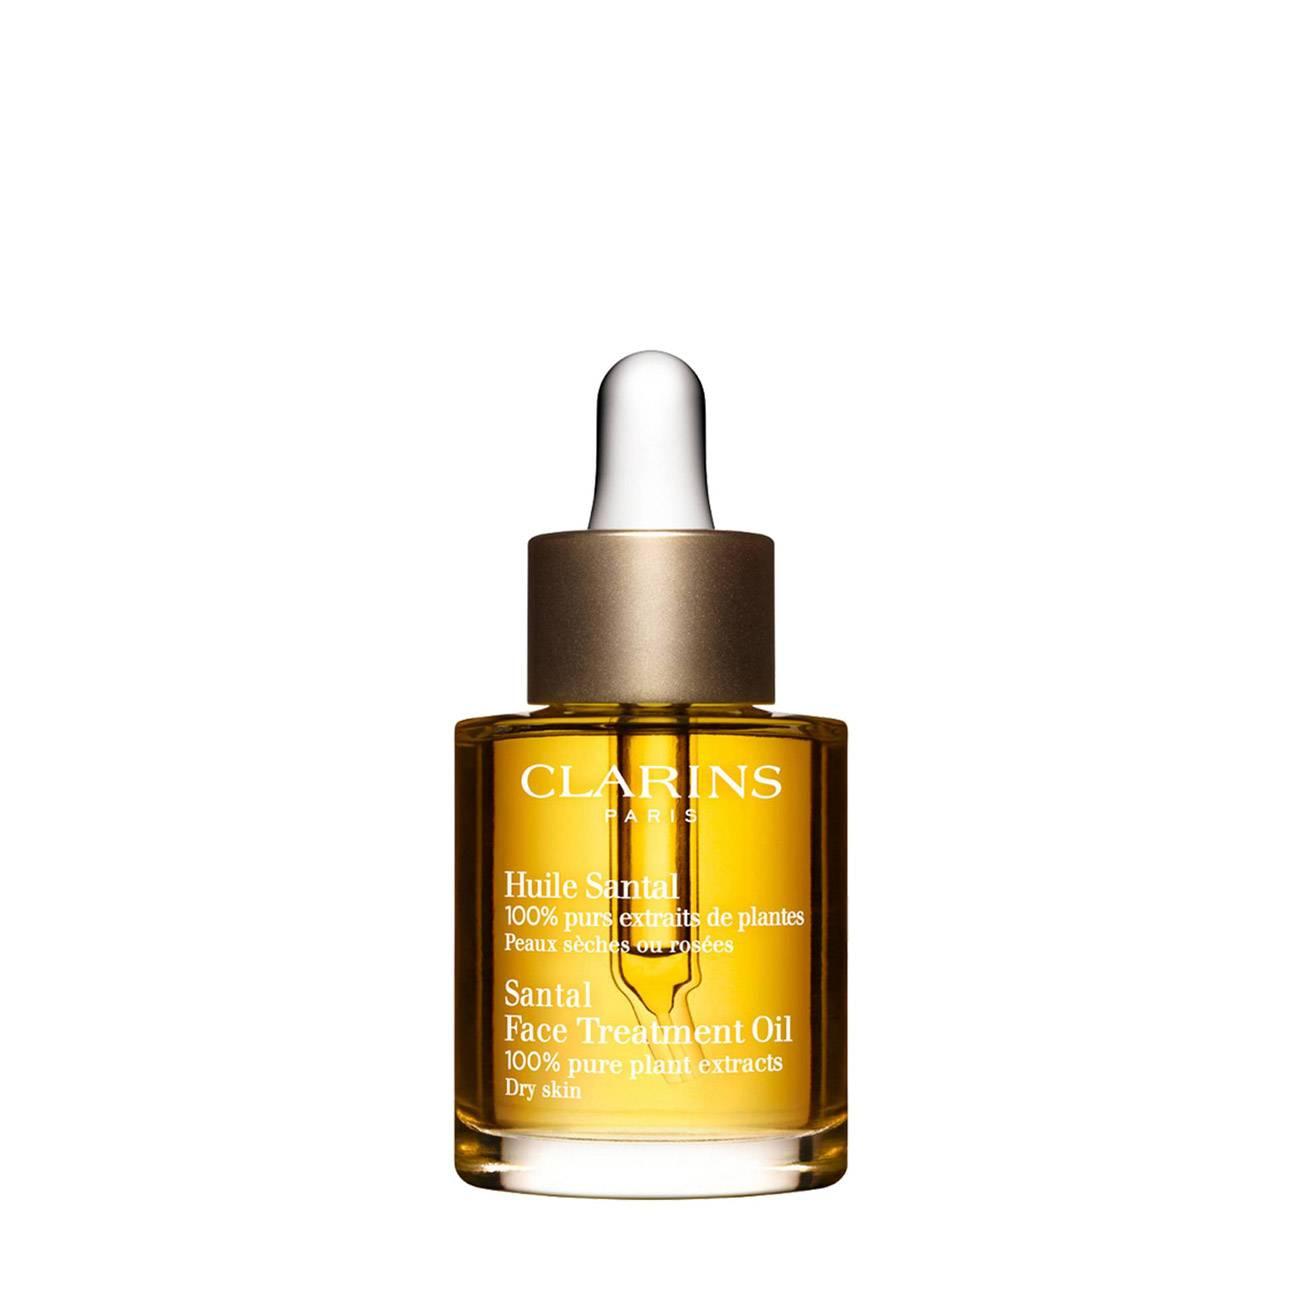 Face Treatment Santal Oil 30 Ml Clarins imagine 2021 bestvalue.eu